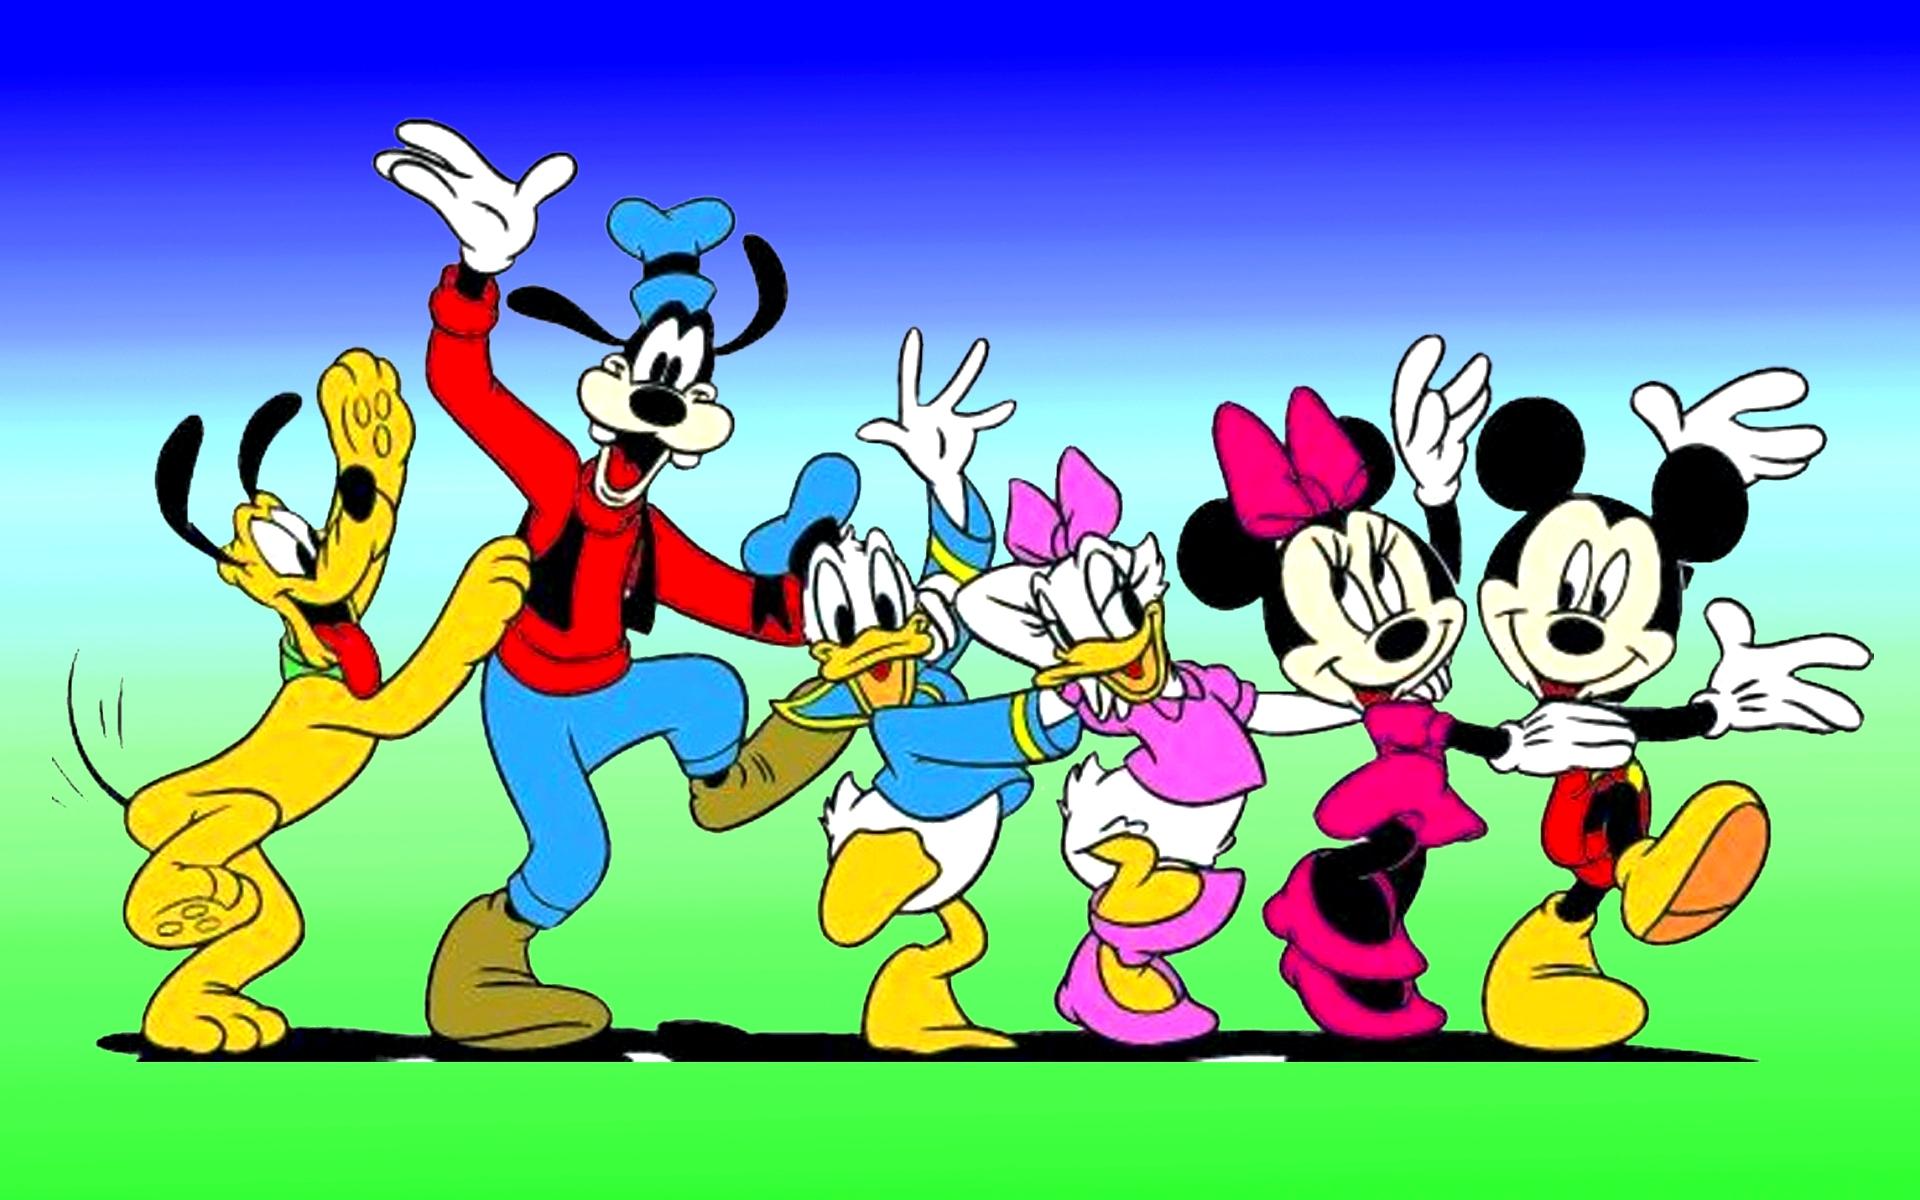 картинки микки маус и его друзья